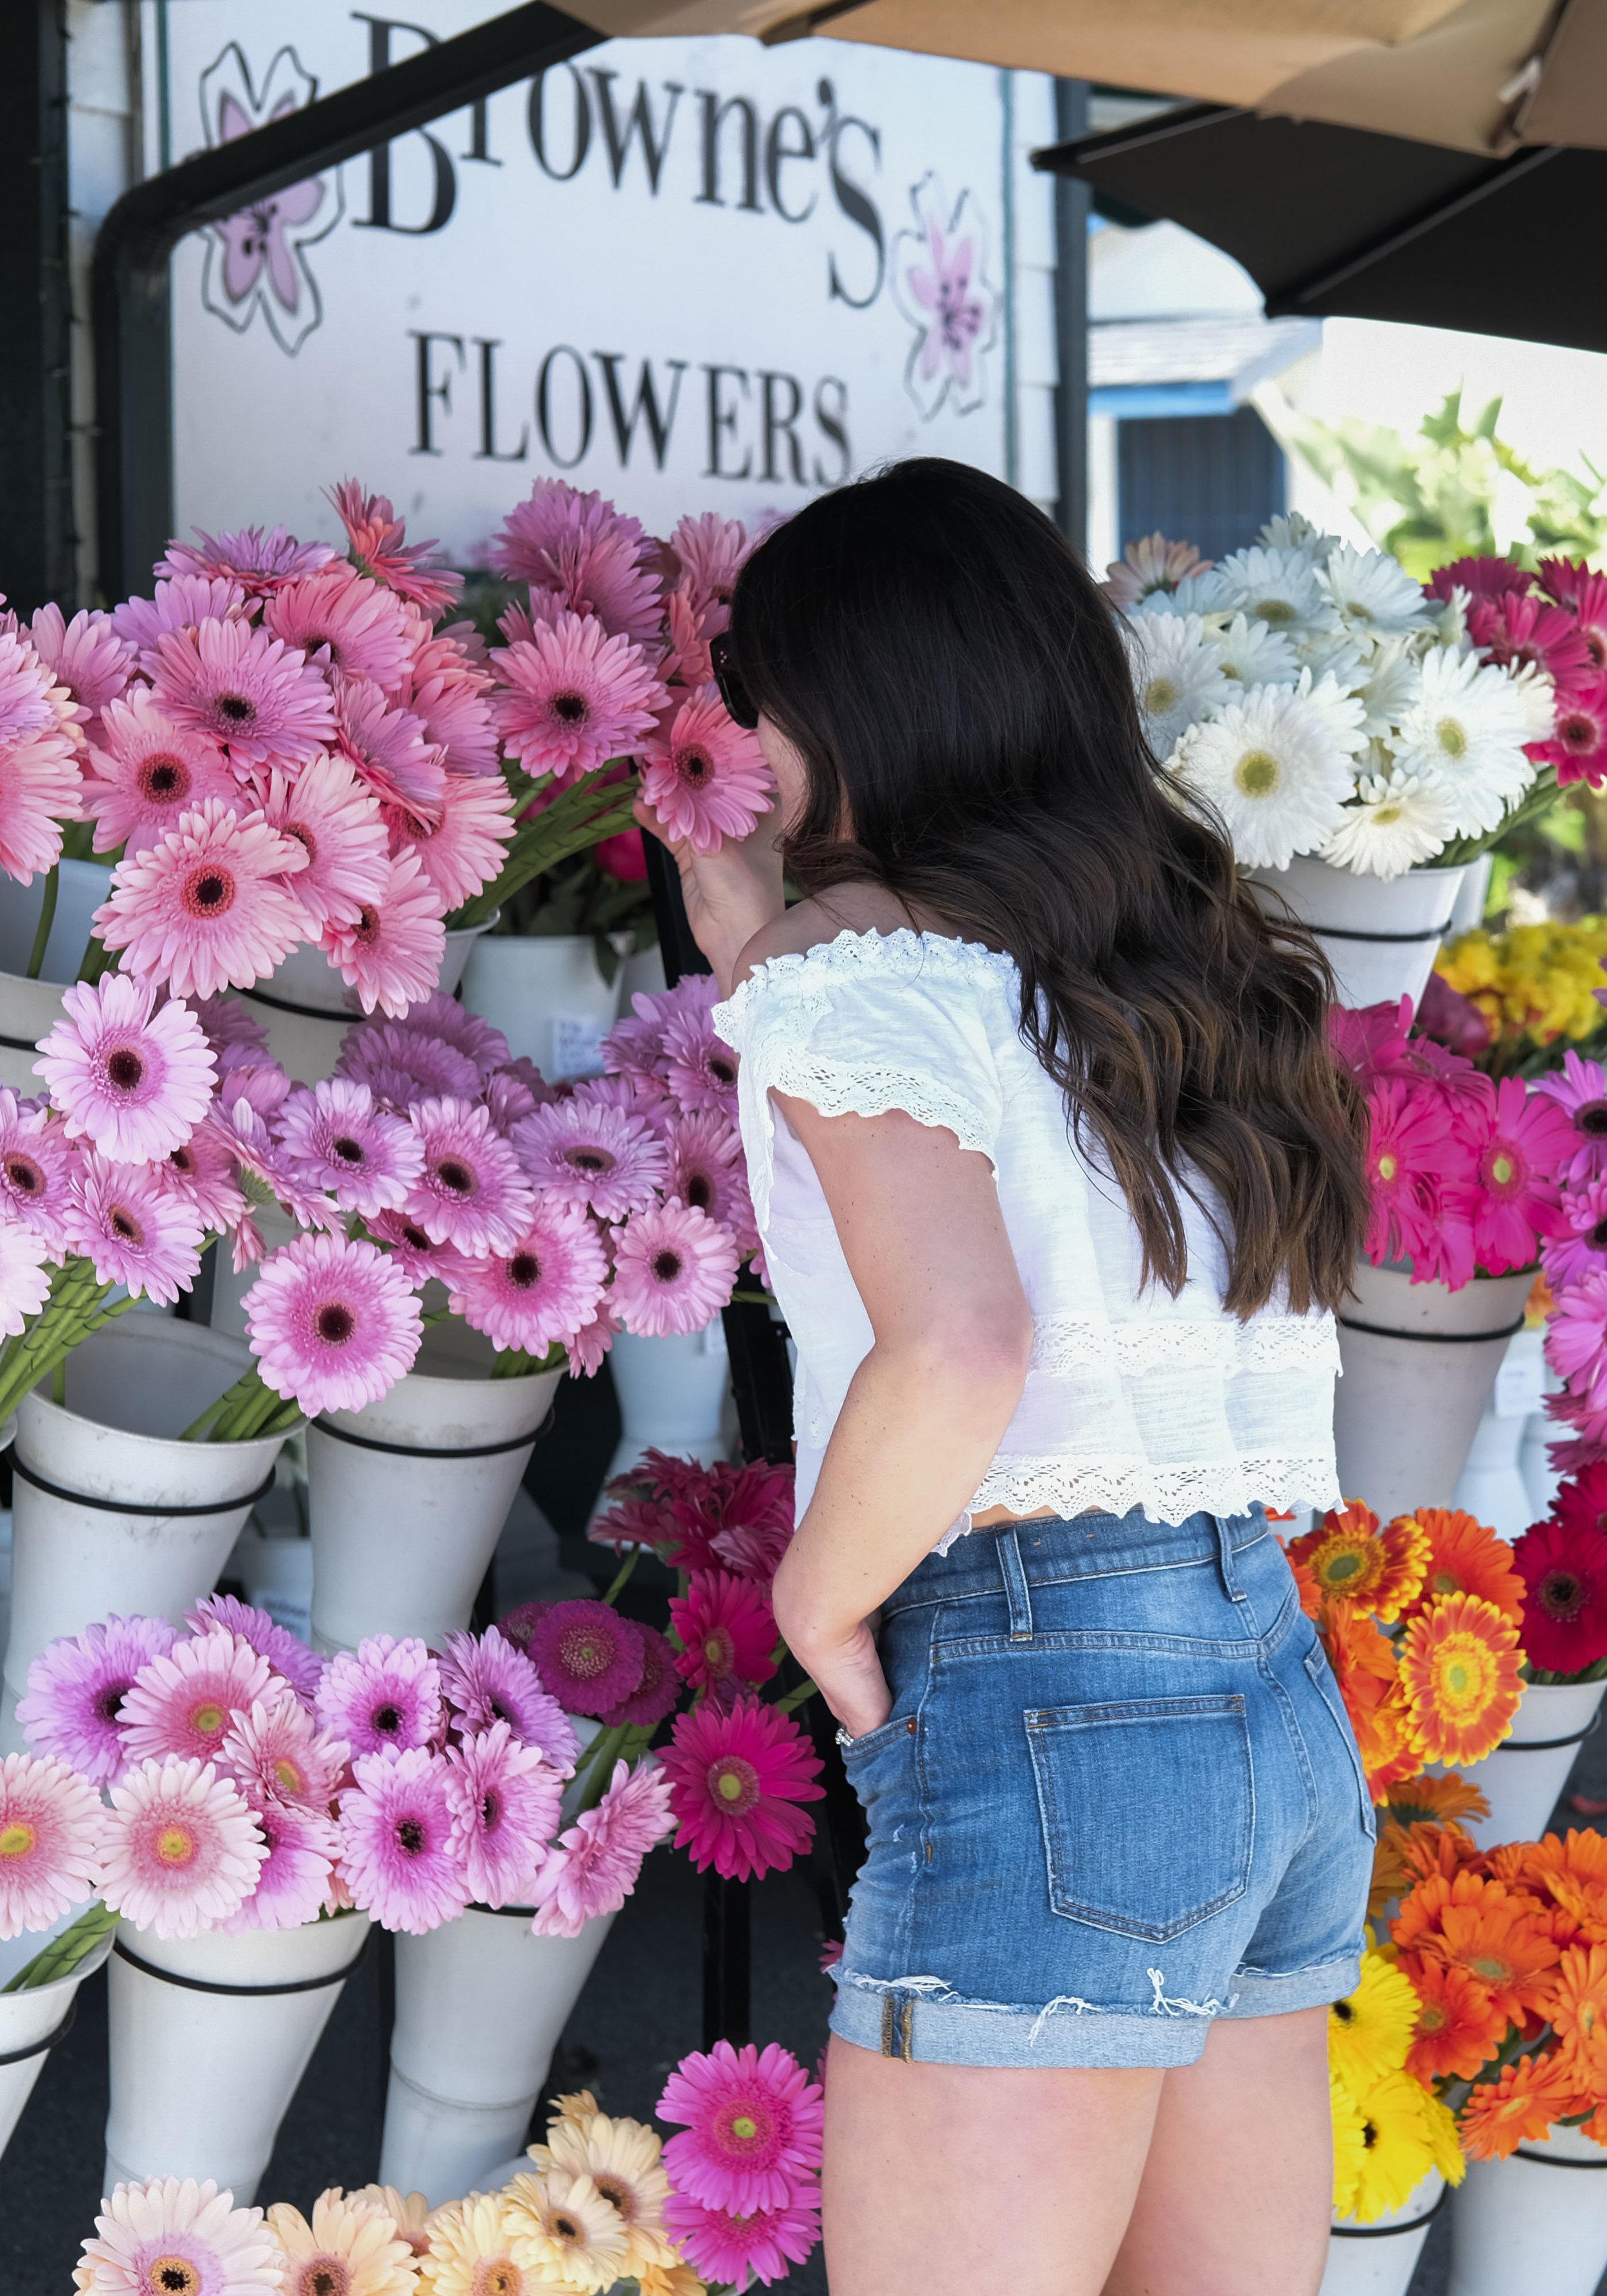 Madewell cuffed high waist denim shorts, Rip Curl Atlas Off the shoulder crop top, Browne's flower shop in Dana Point, Guide to Laguna Beach.